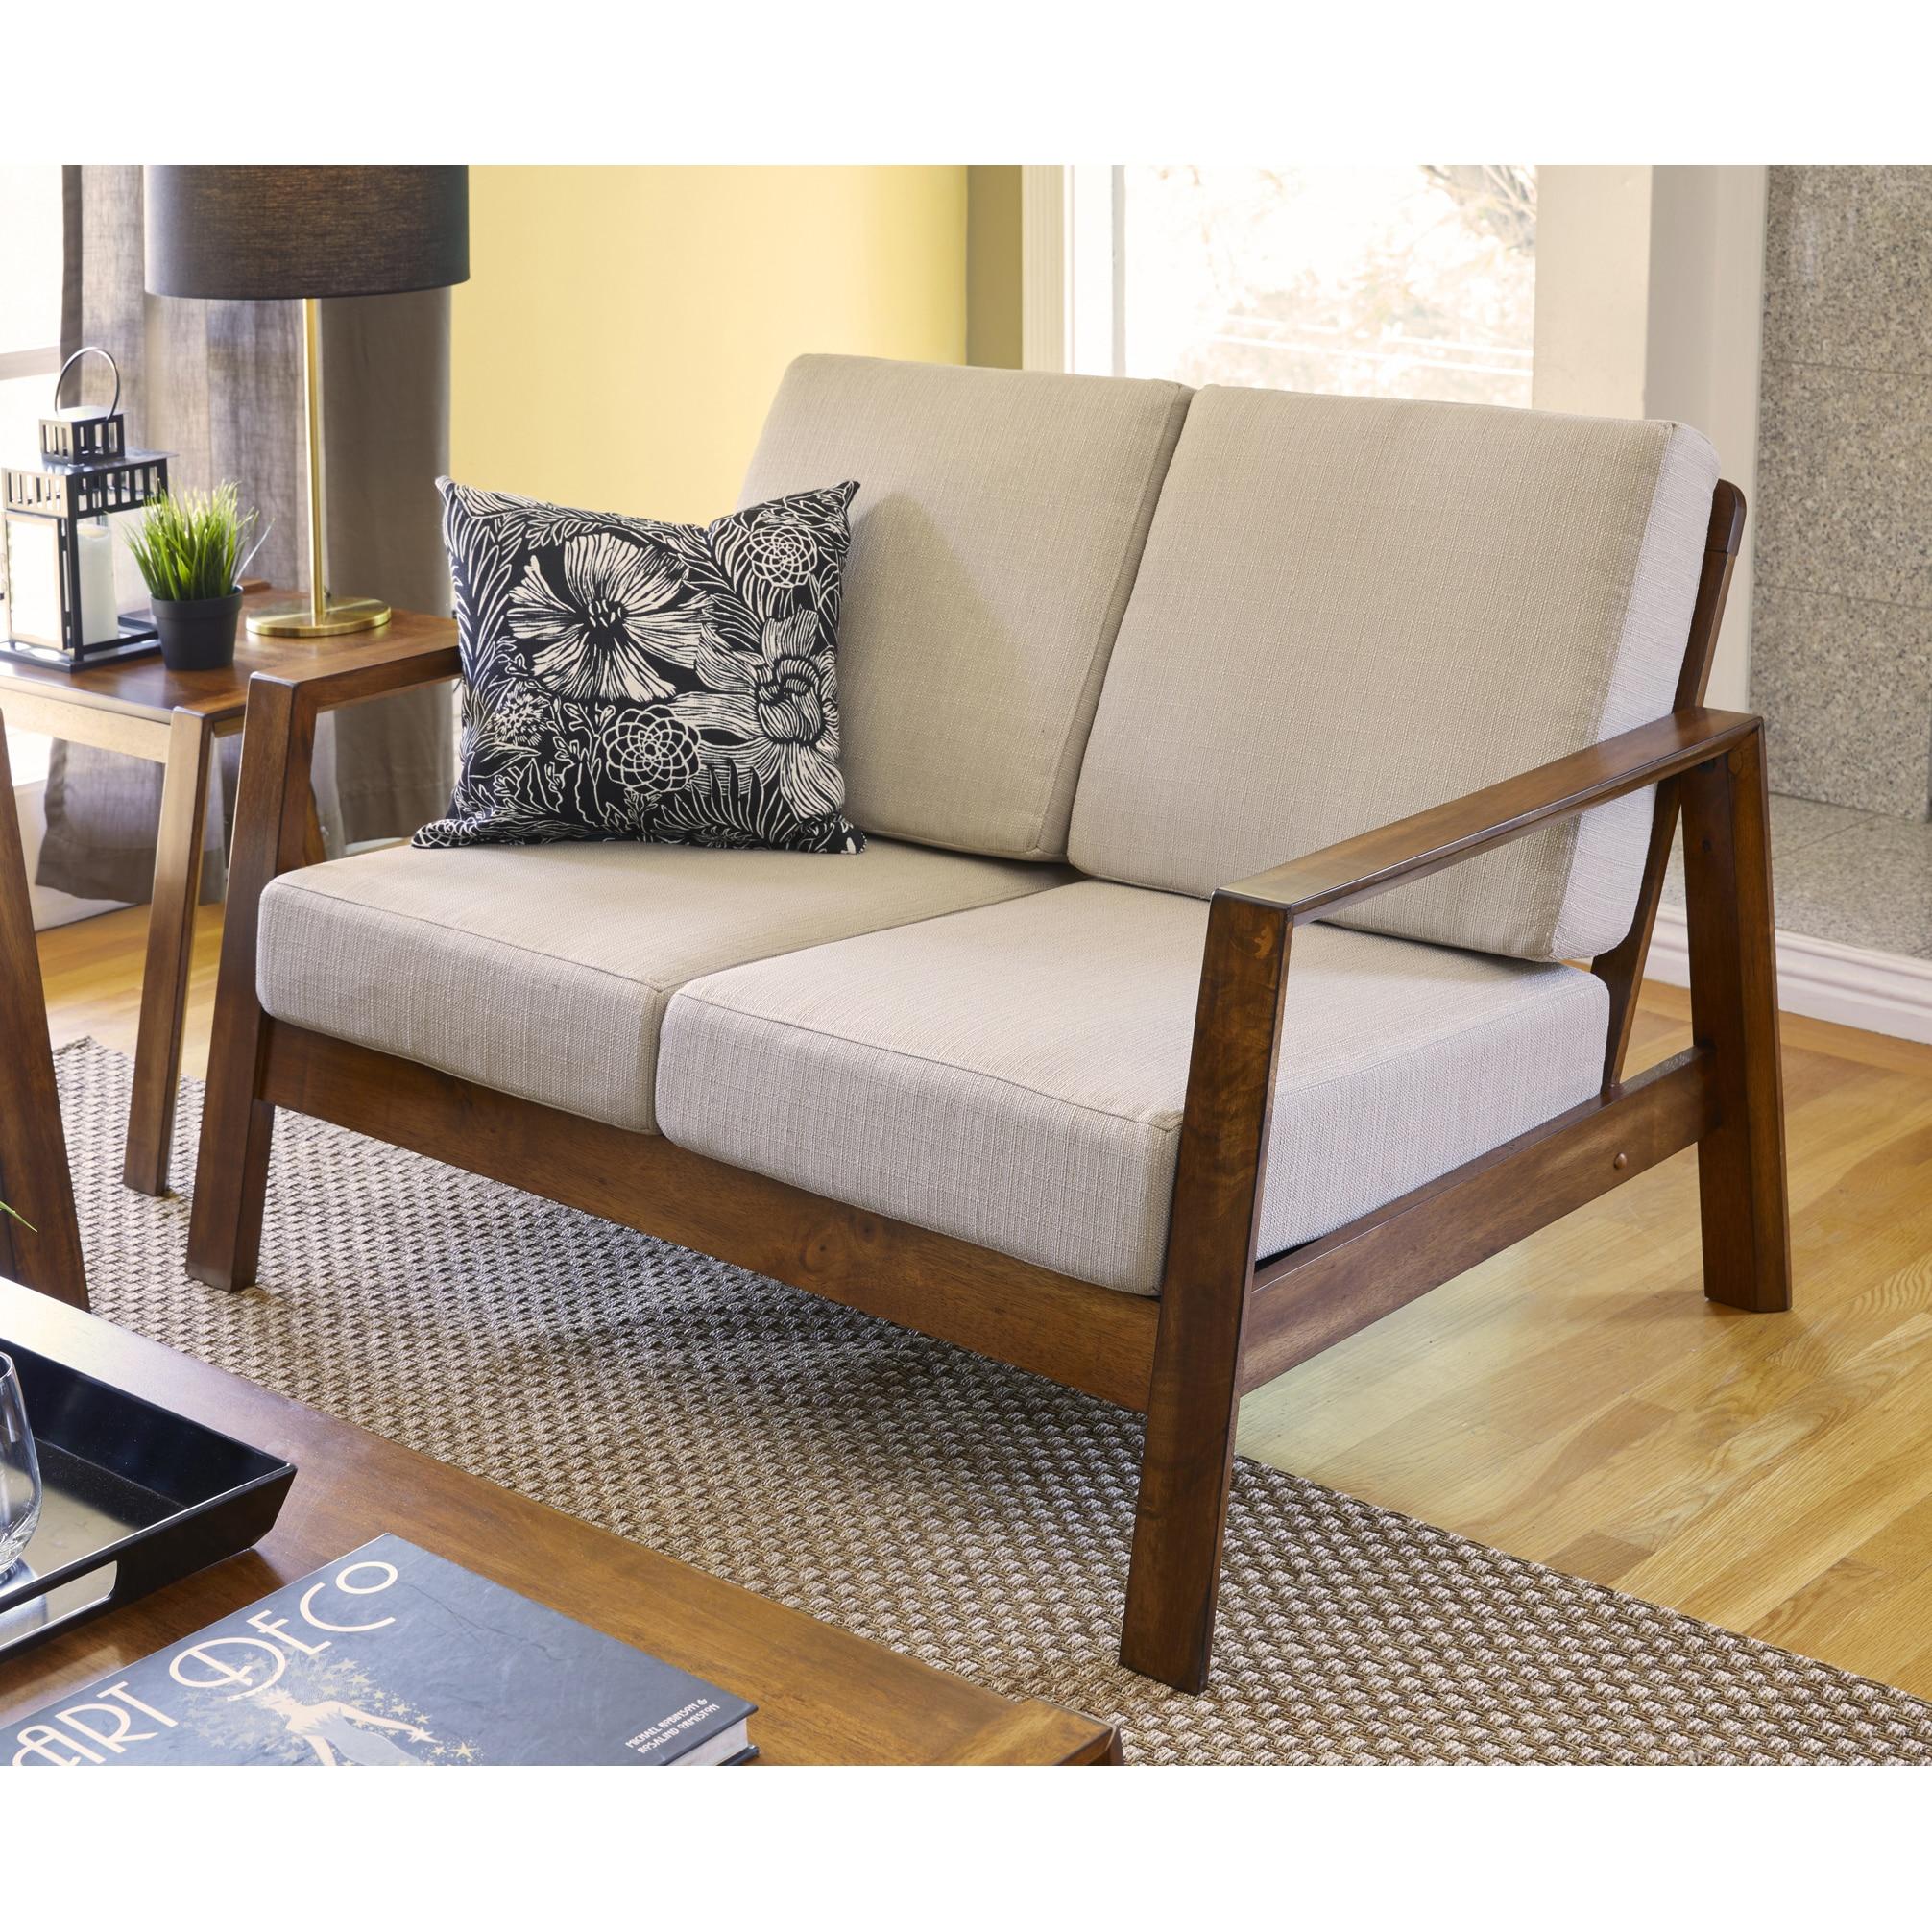 Handy Living Columbus Mid Century Modern Barley Tan Linen Loveseat with Exposed Wood Frame